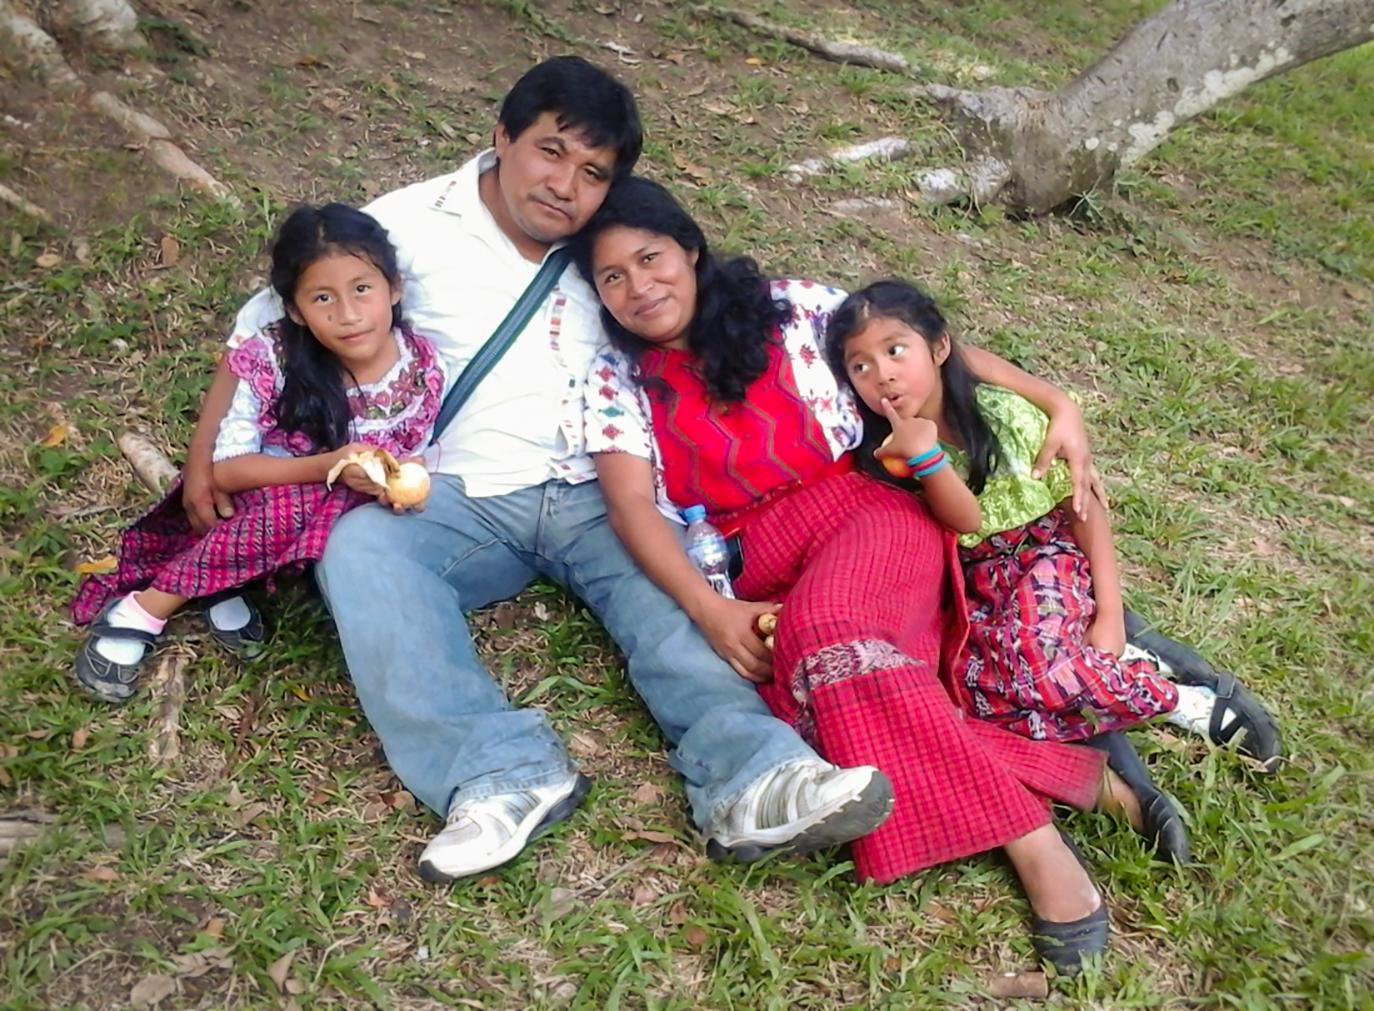 Bernardo Caal and his family